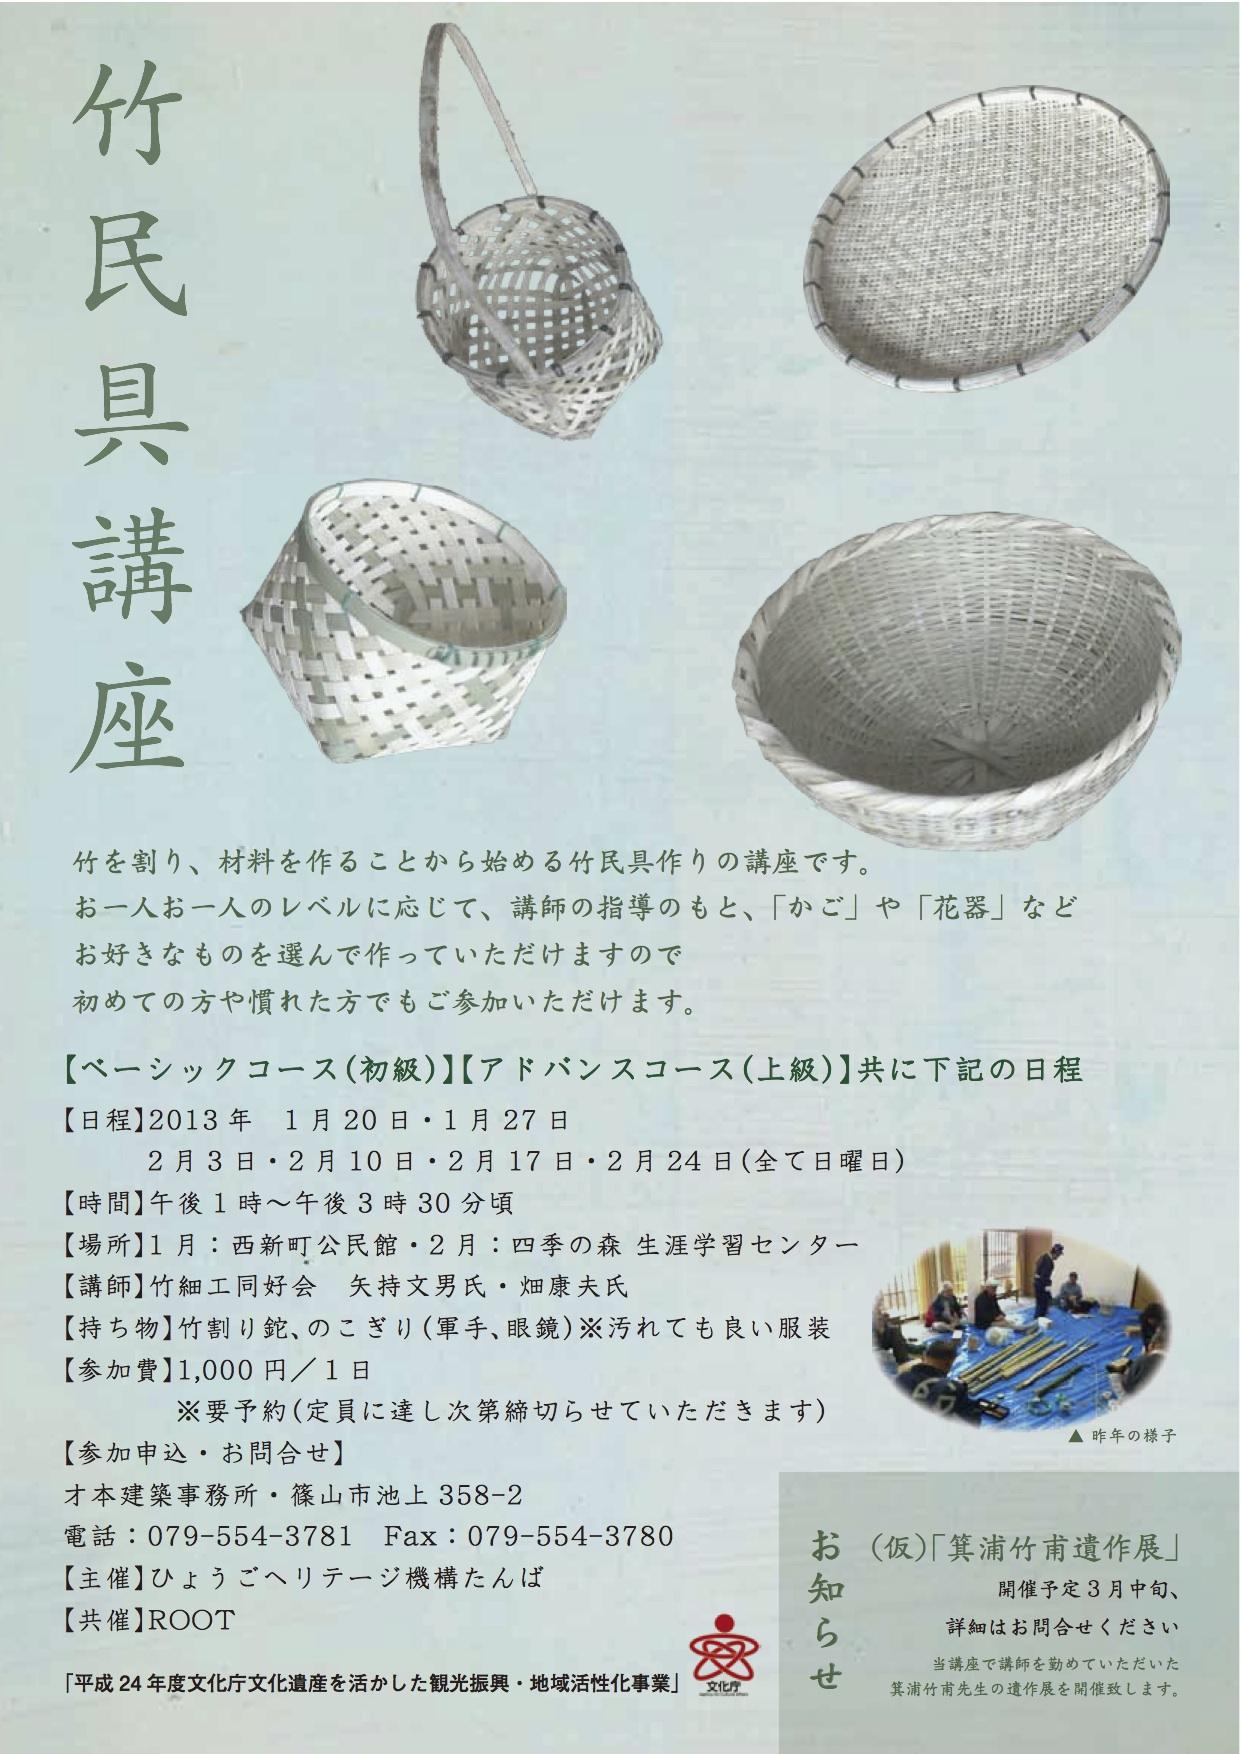 http://rootsy.jp/images/take-mingu-koza-2013.jpg